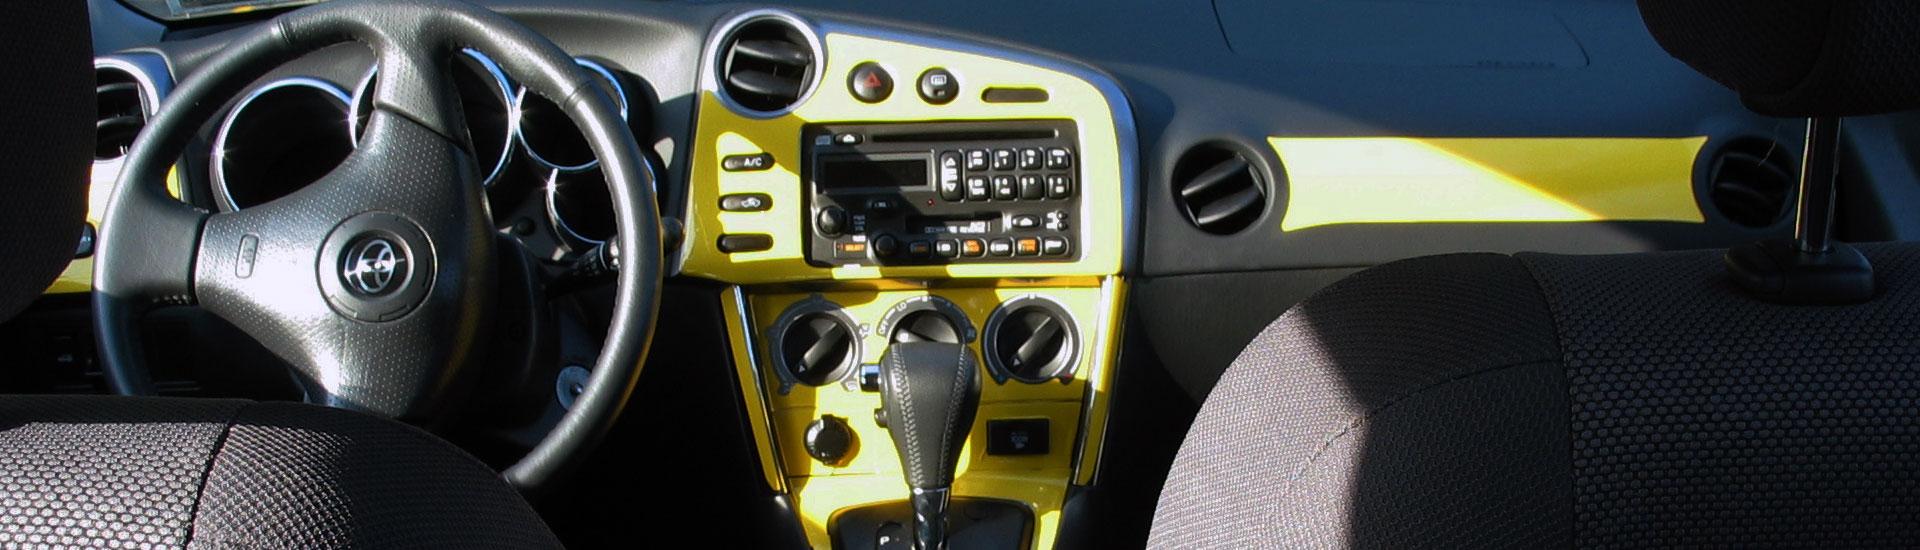 Toyota Matrix Dash Kits Custom Toyota Matrix Dash Kit